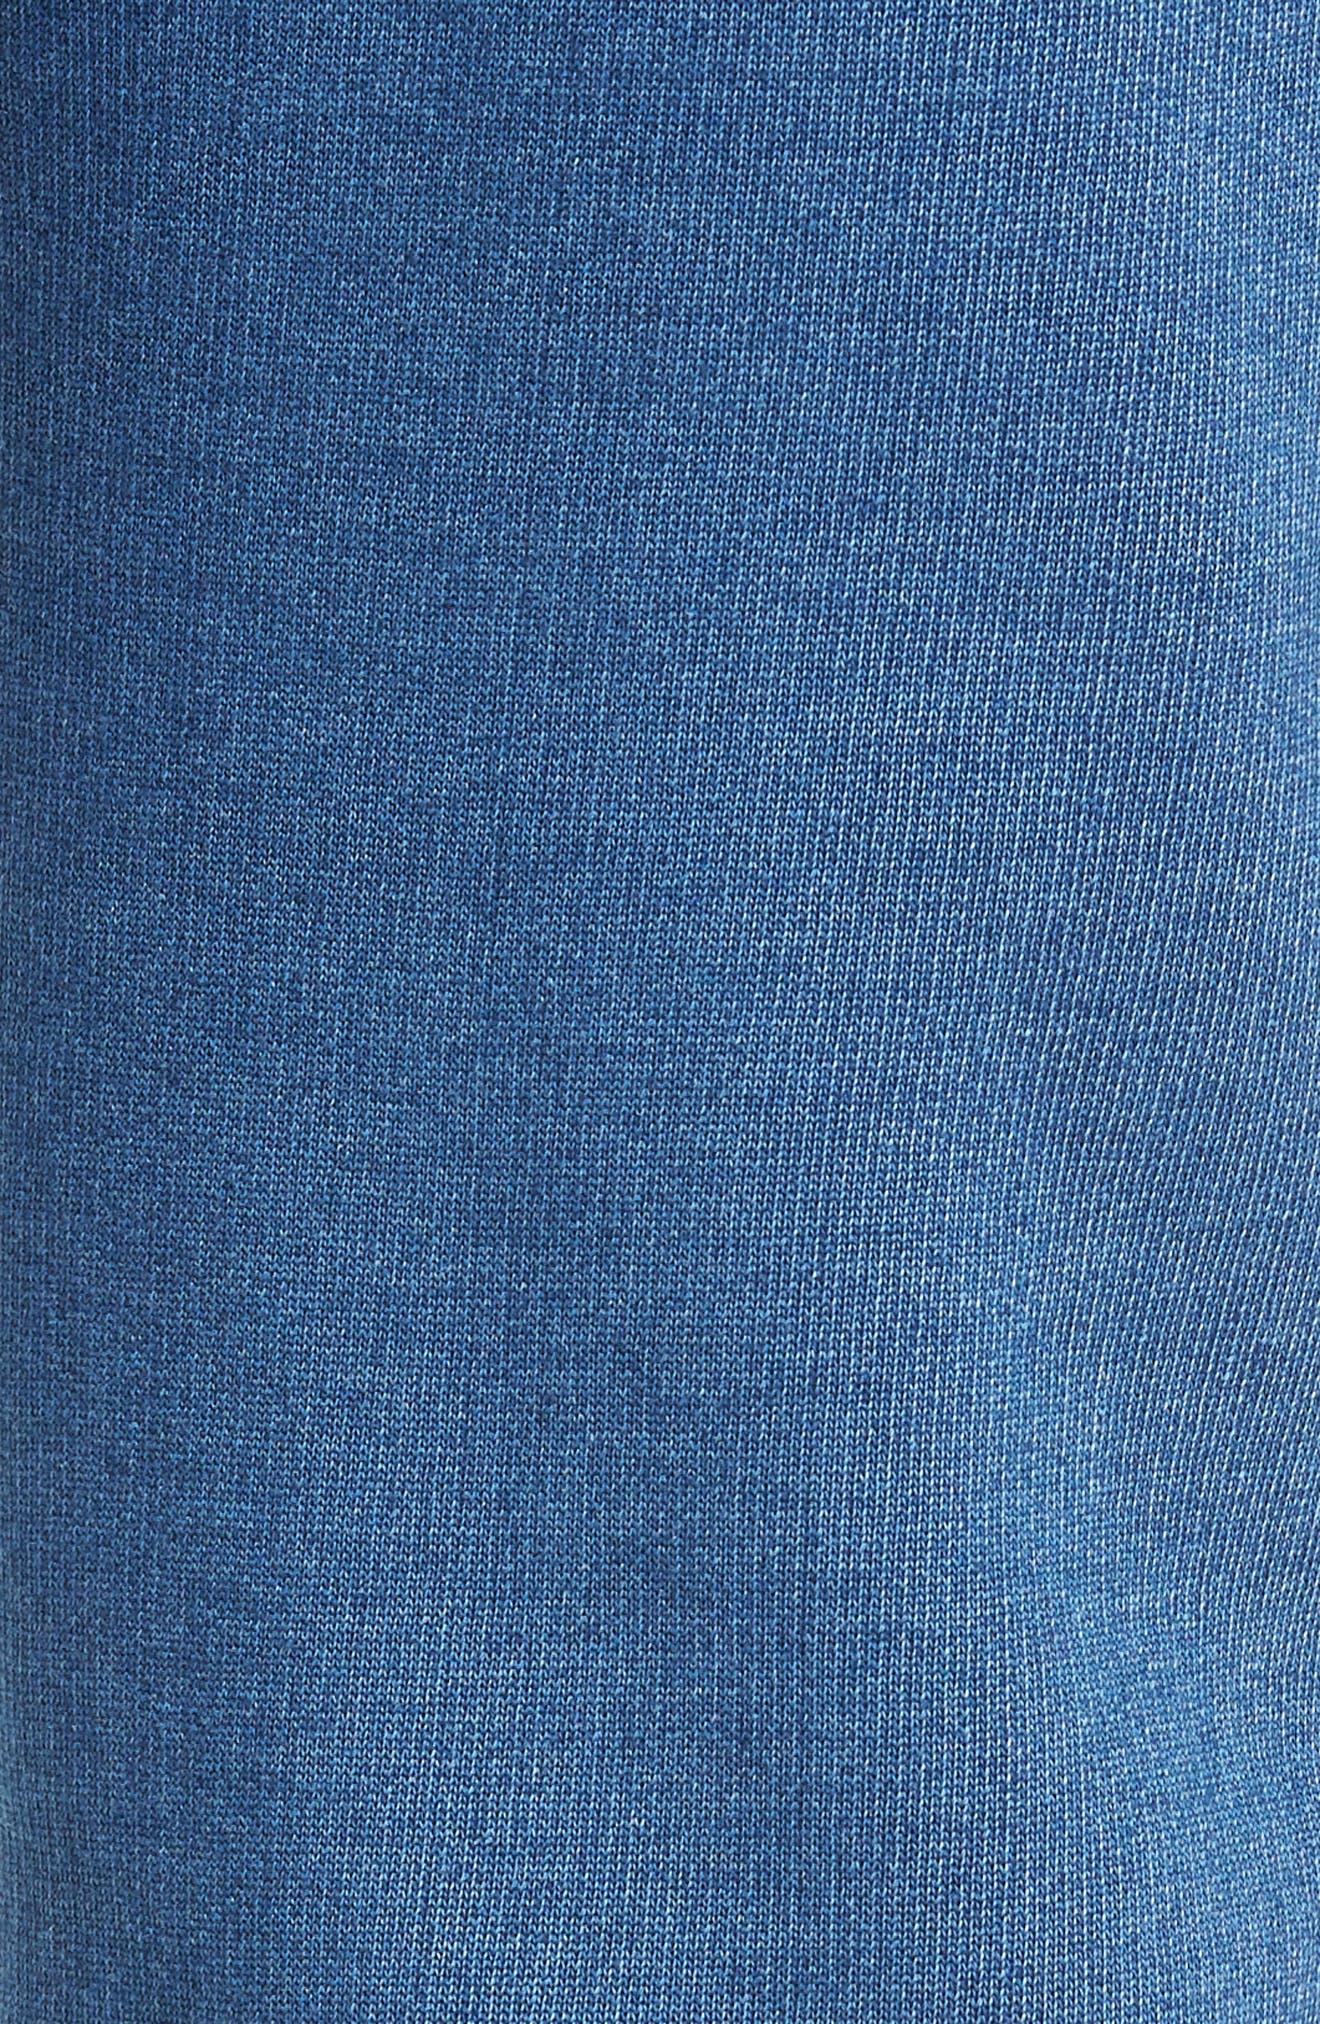 Indigo Chino Sweatpants,                             Alternate thumbnail 5, color,                             MEDIUM INDIGO